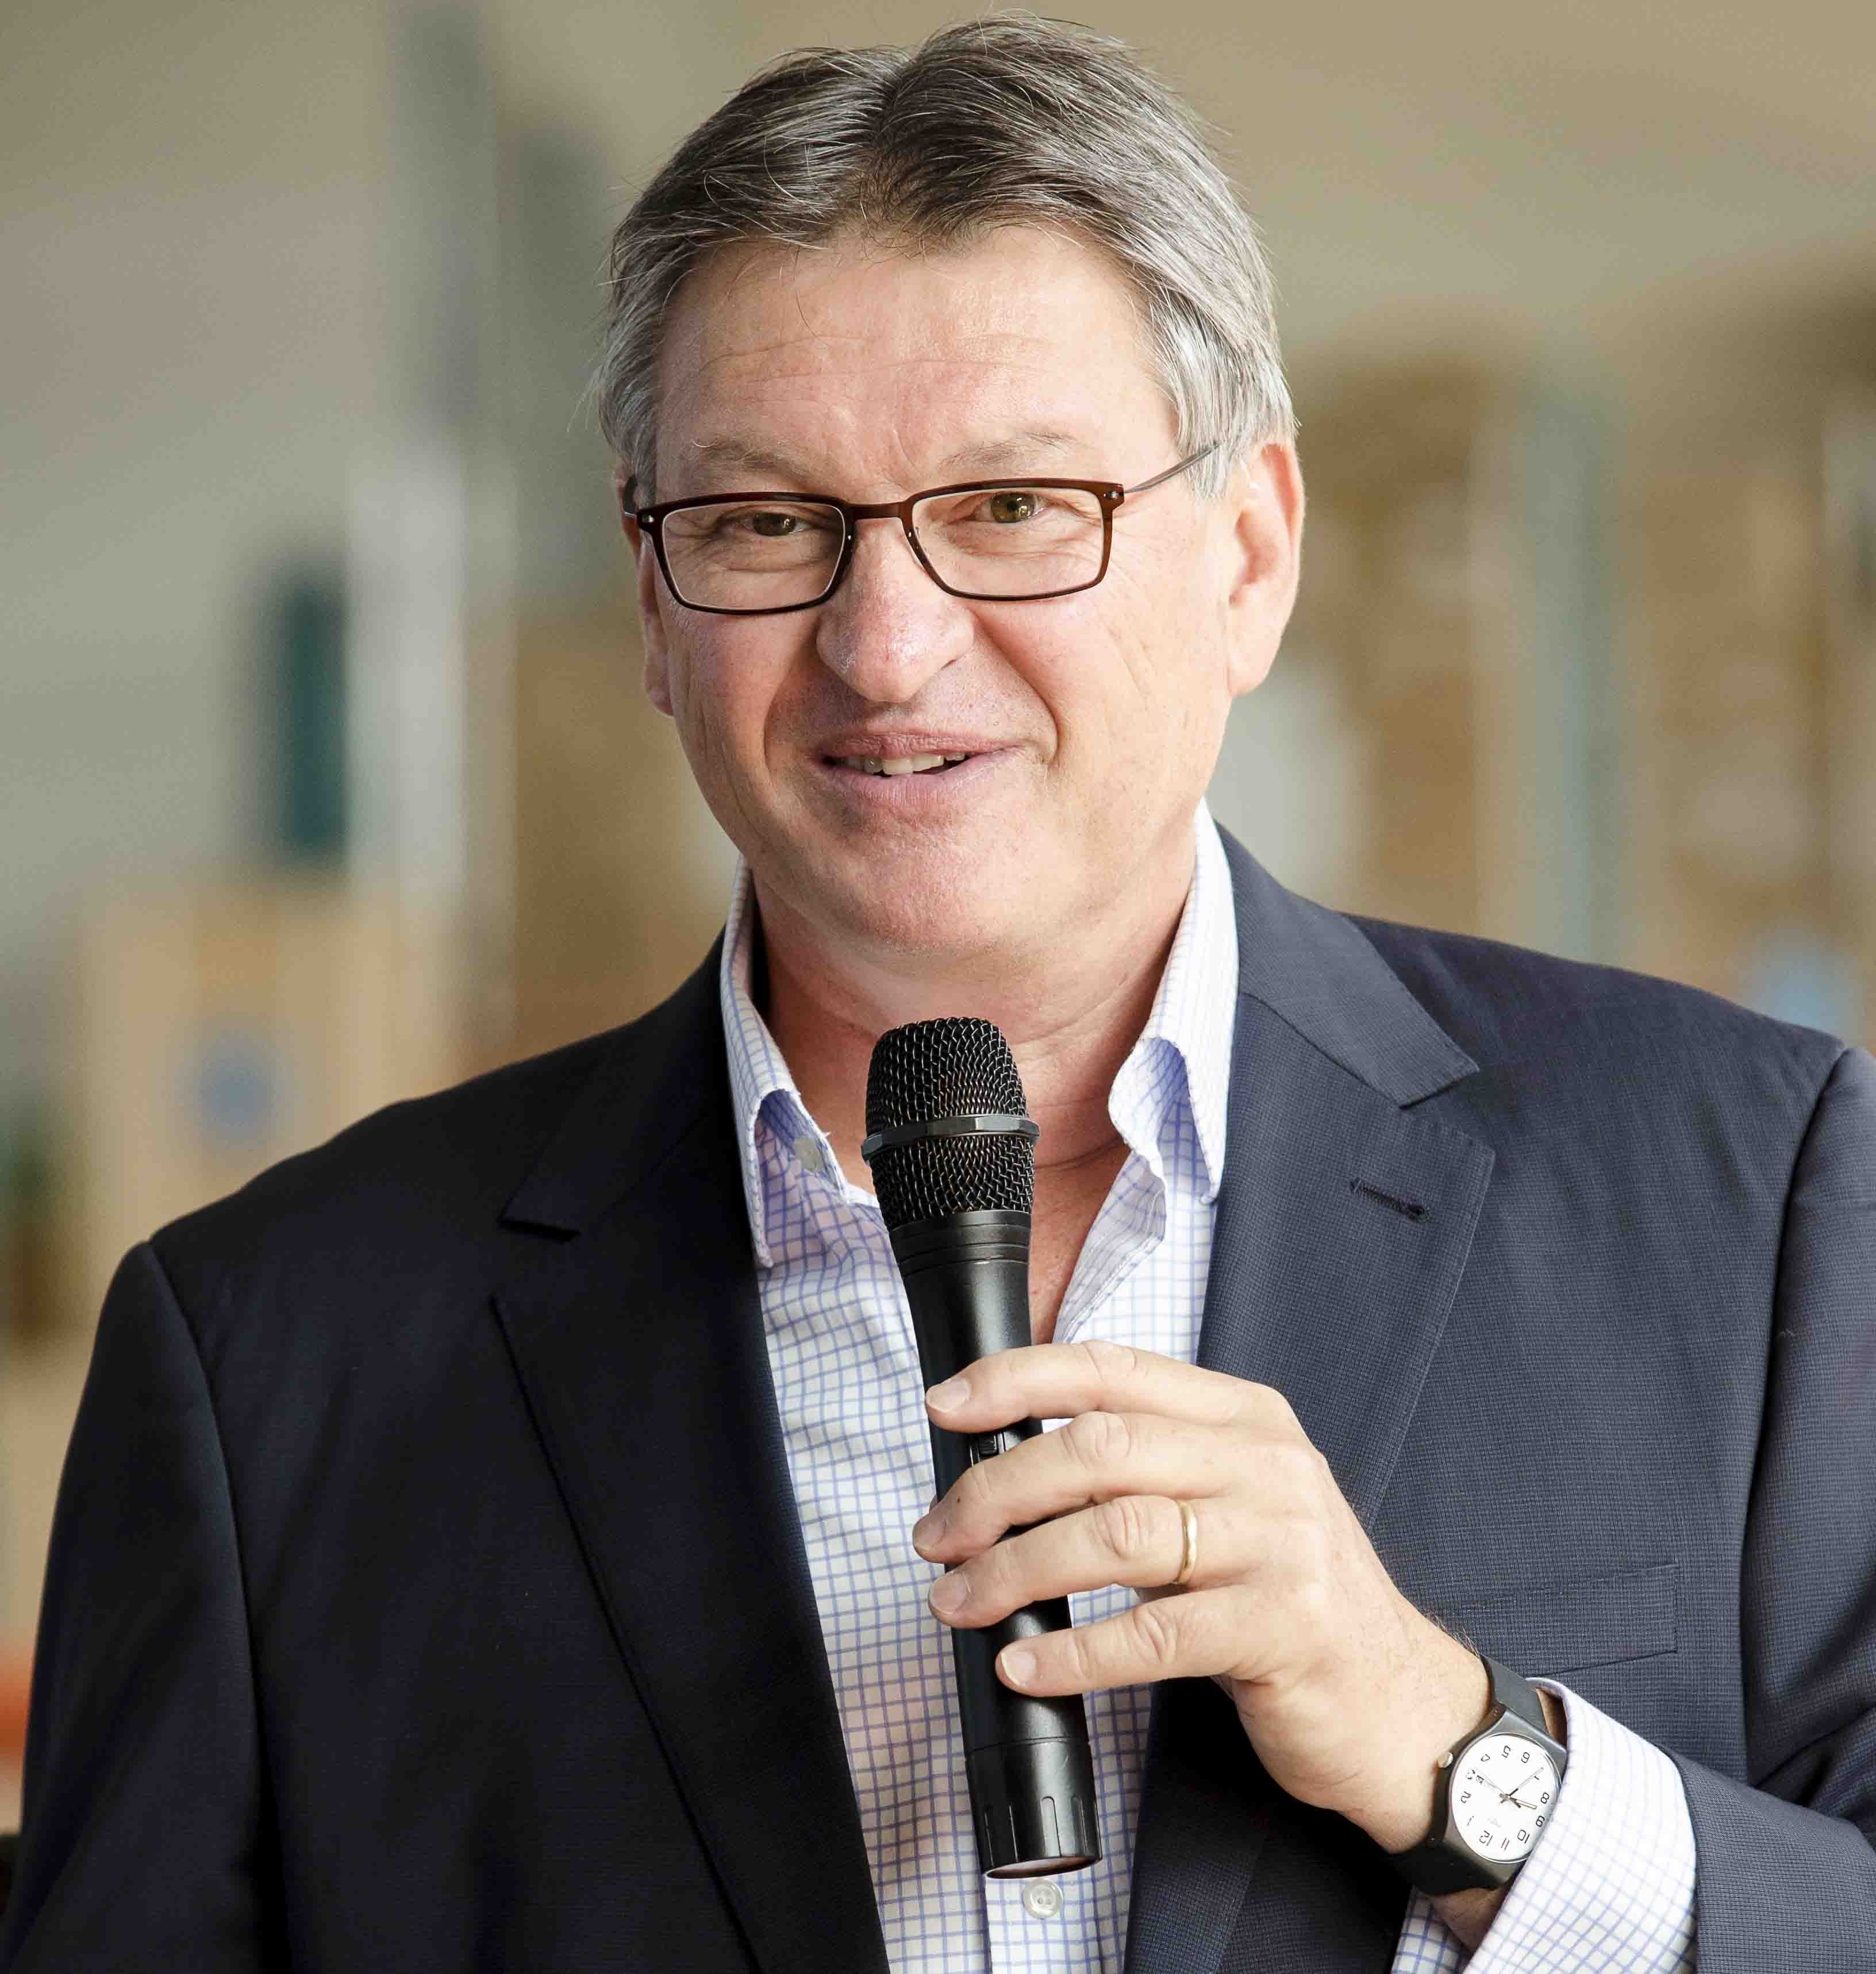 Stef du Plessis-SA Best Speaker 4